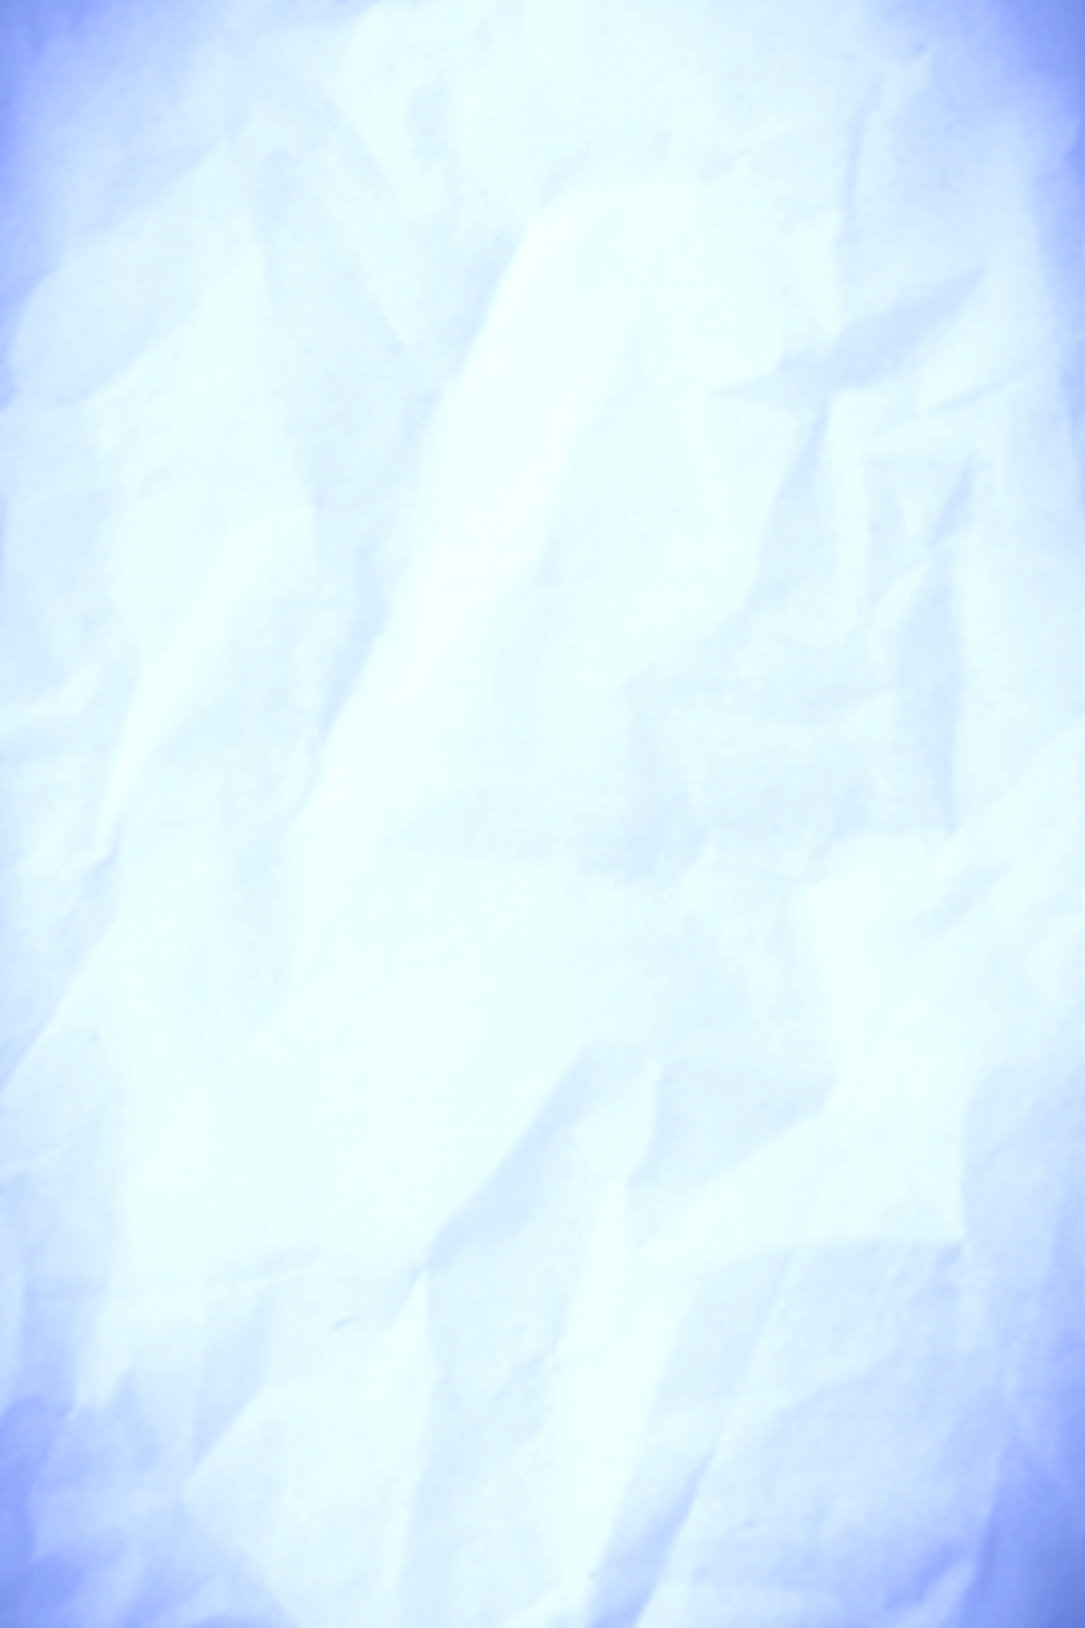 marjanblan-794QUz5-cso-unsplash_edited_e